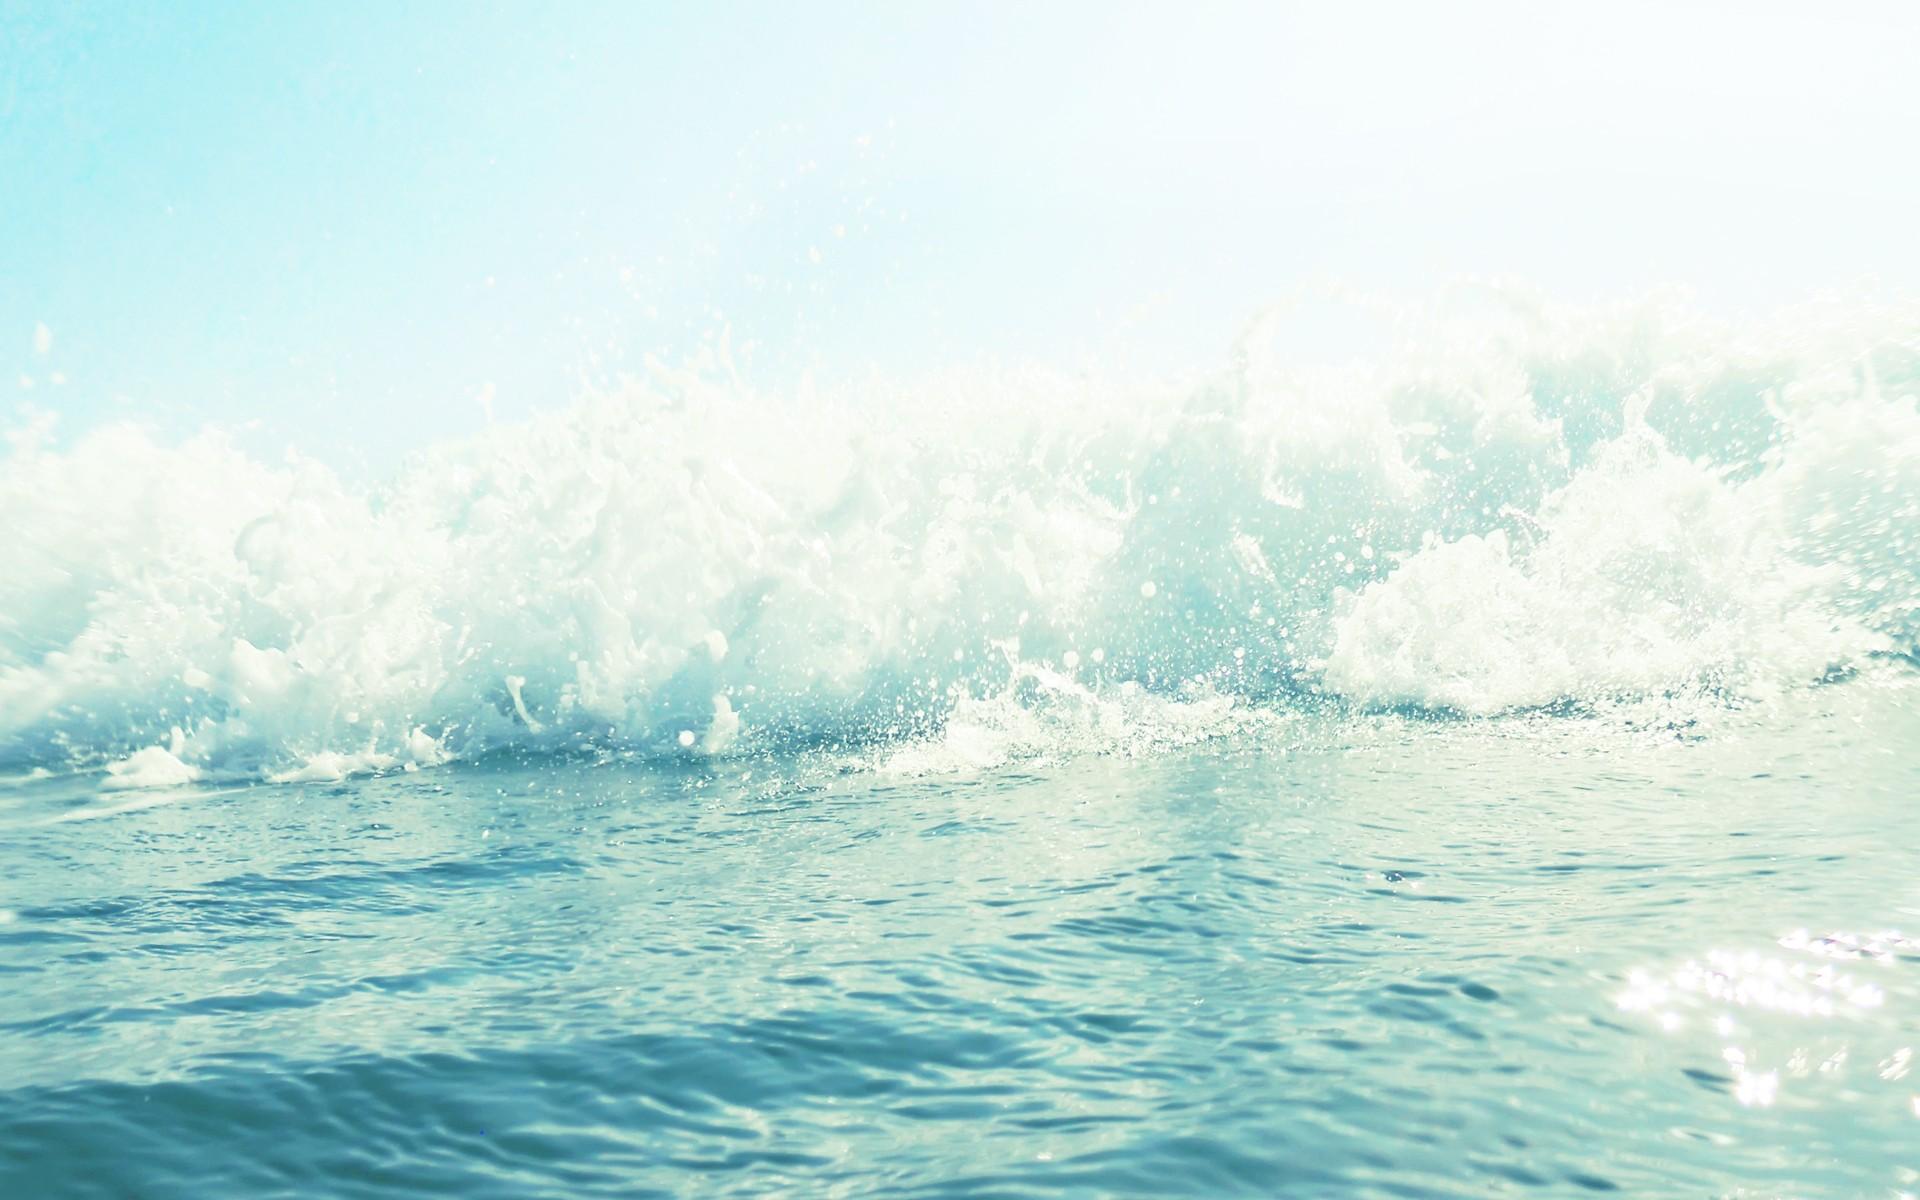 Ocean Wave Water drops bokeh wallpaper background